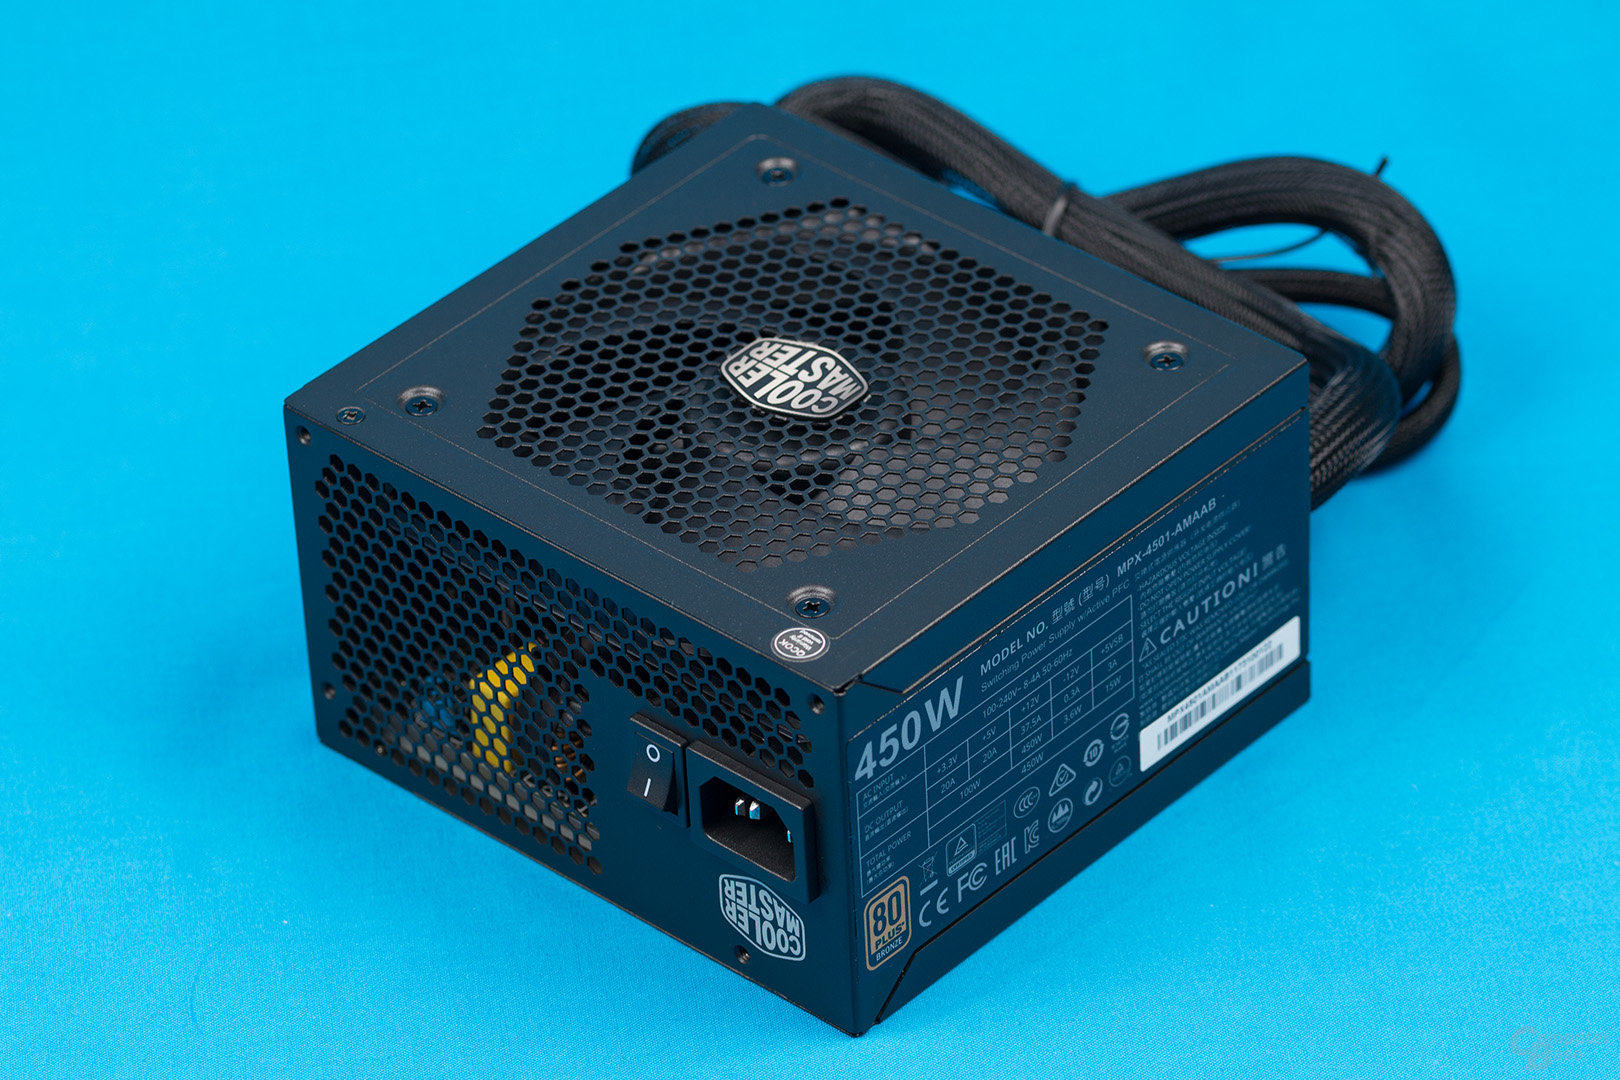 Cooler Master MasterWatt 450W